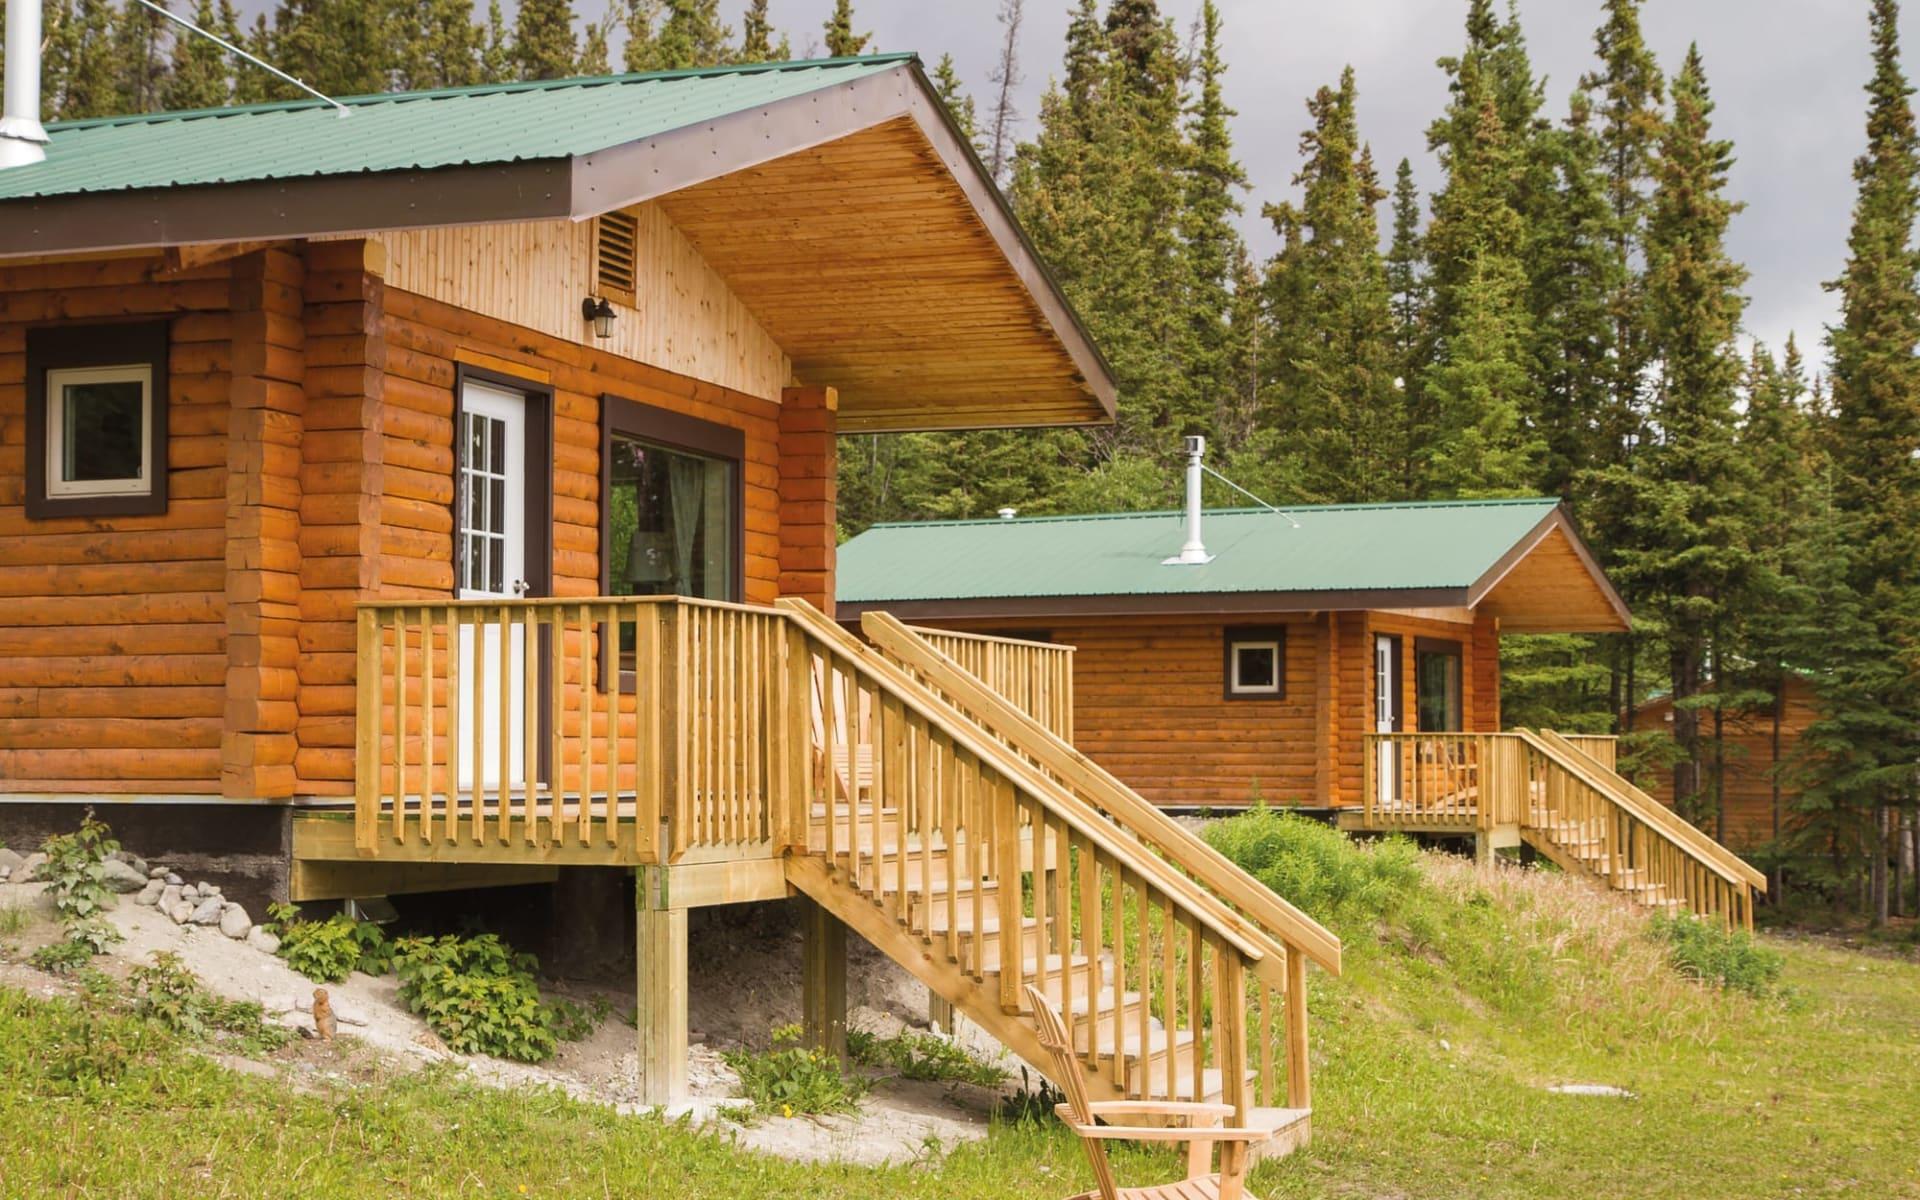 Southern Lakes Resort & Restaurant in Tagish: Exterior_Southern Lakes Resorts_ Aussenansicht Cabin_c Jonview